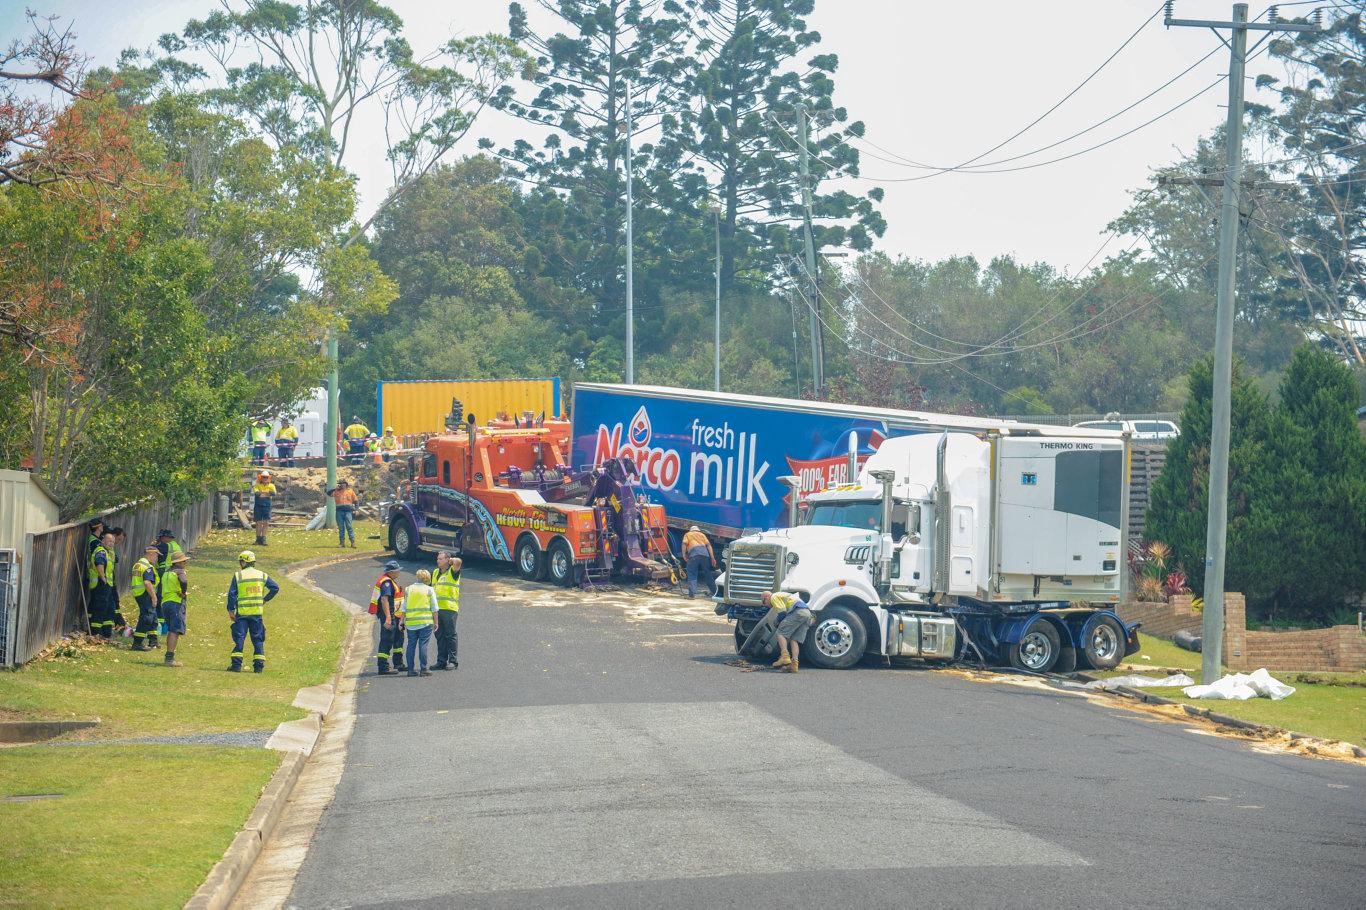 Emergency services attend scene of truck crash on Azalea Avenue in Coffs Harbour.